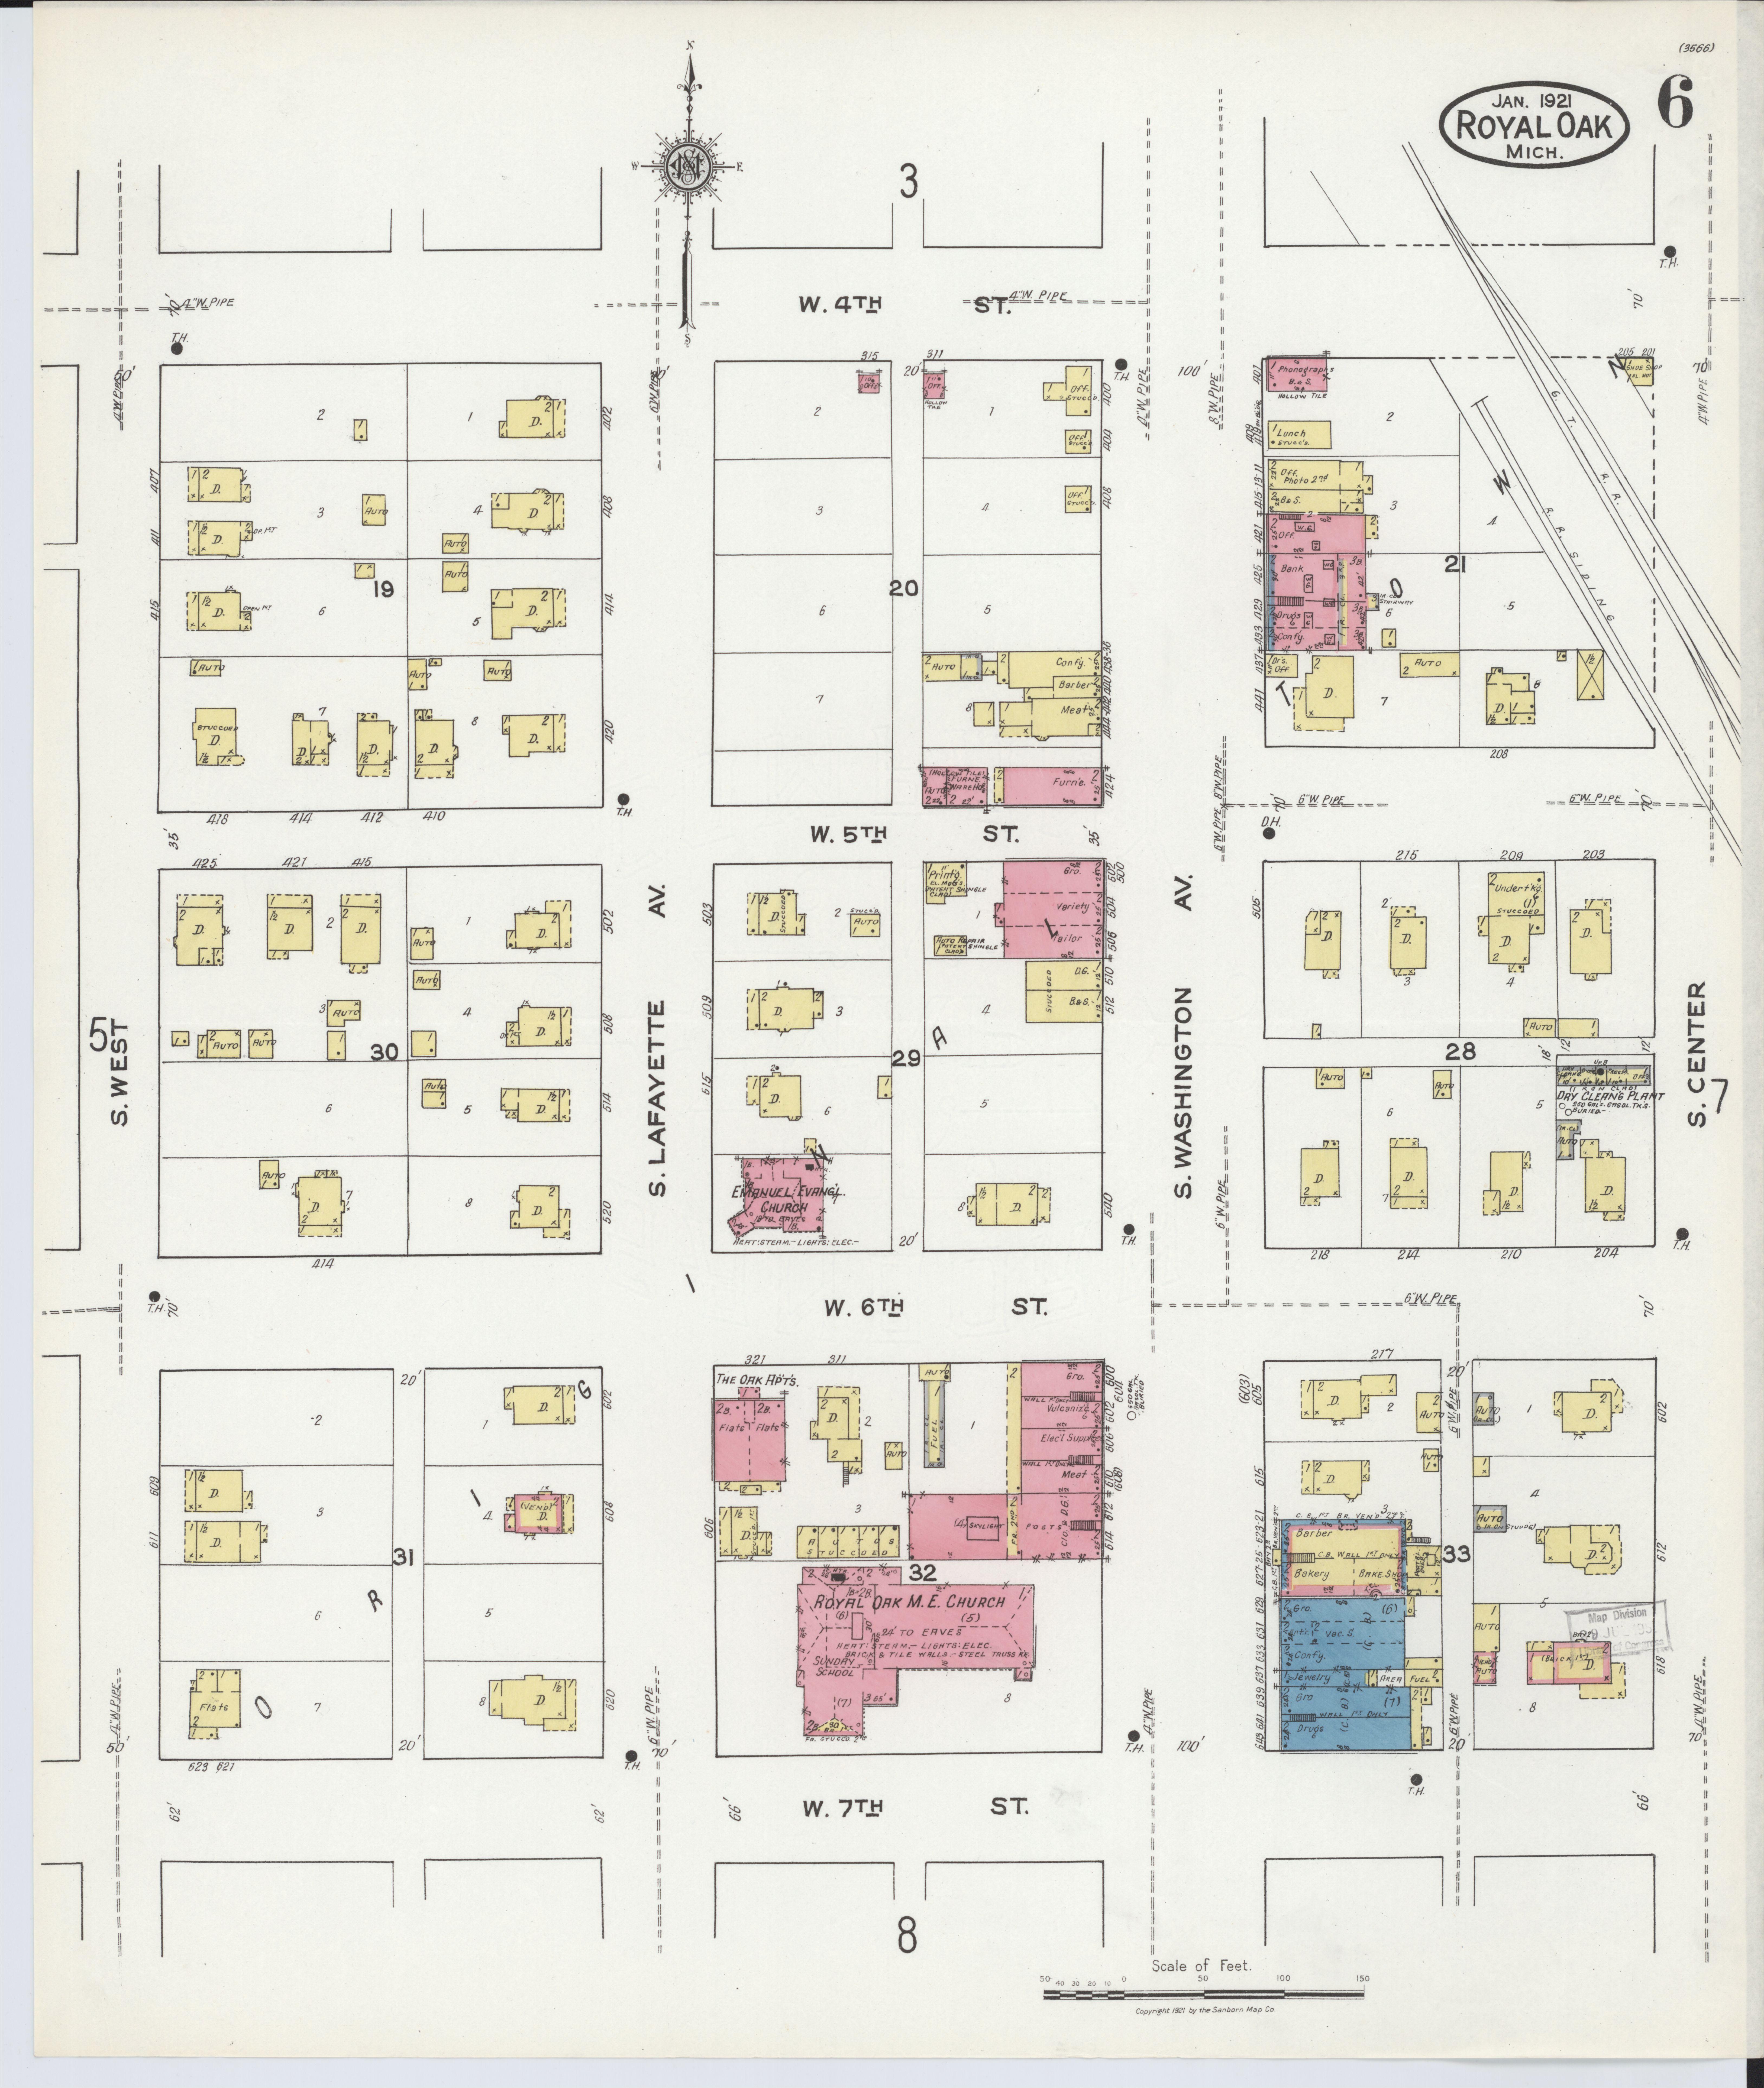 Map Of Royal Oak Michigan File Sanborn Fire Insurance Map From Royal Oak Oakland County